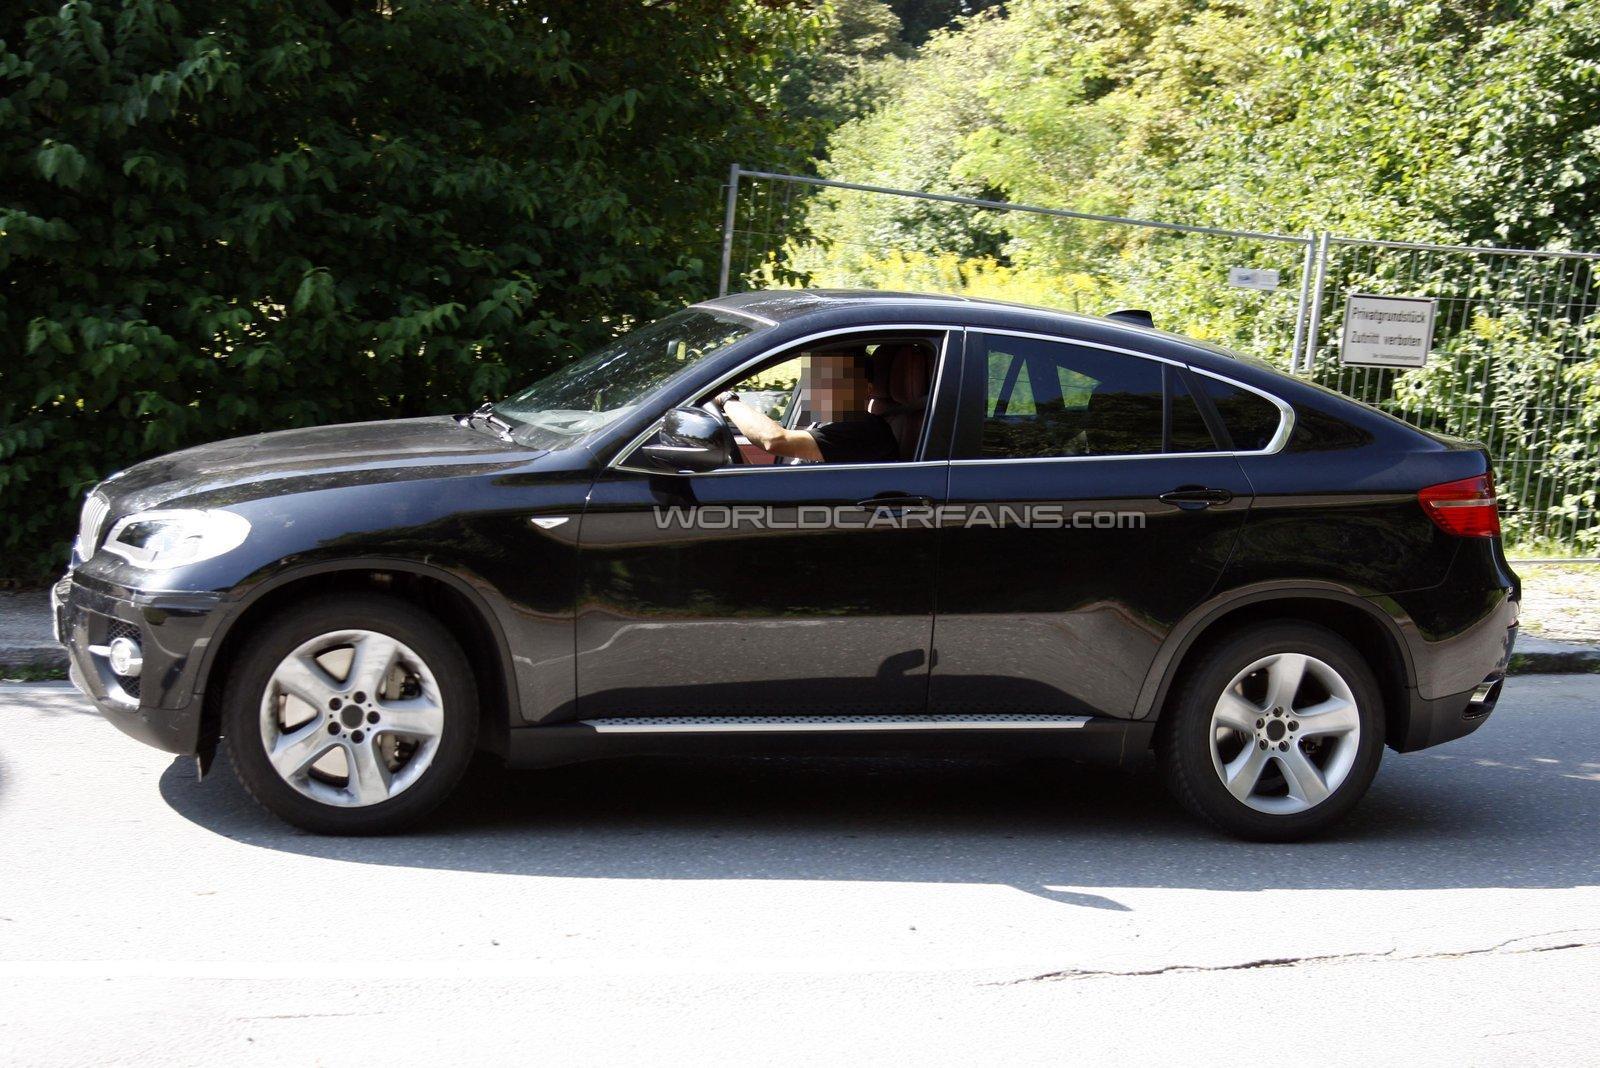 Bmw X6 Facelift Fanaleria Full Led E Quot Triturbo Quot Diesel